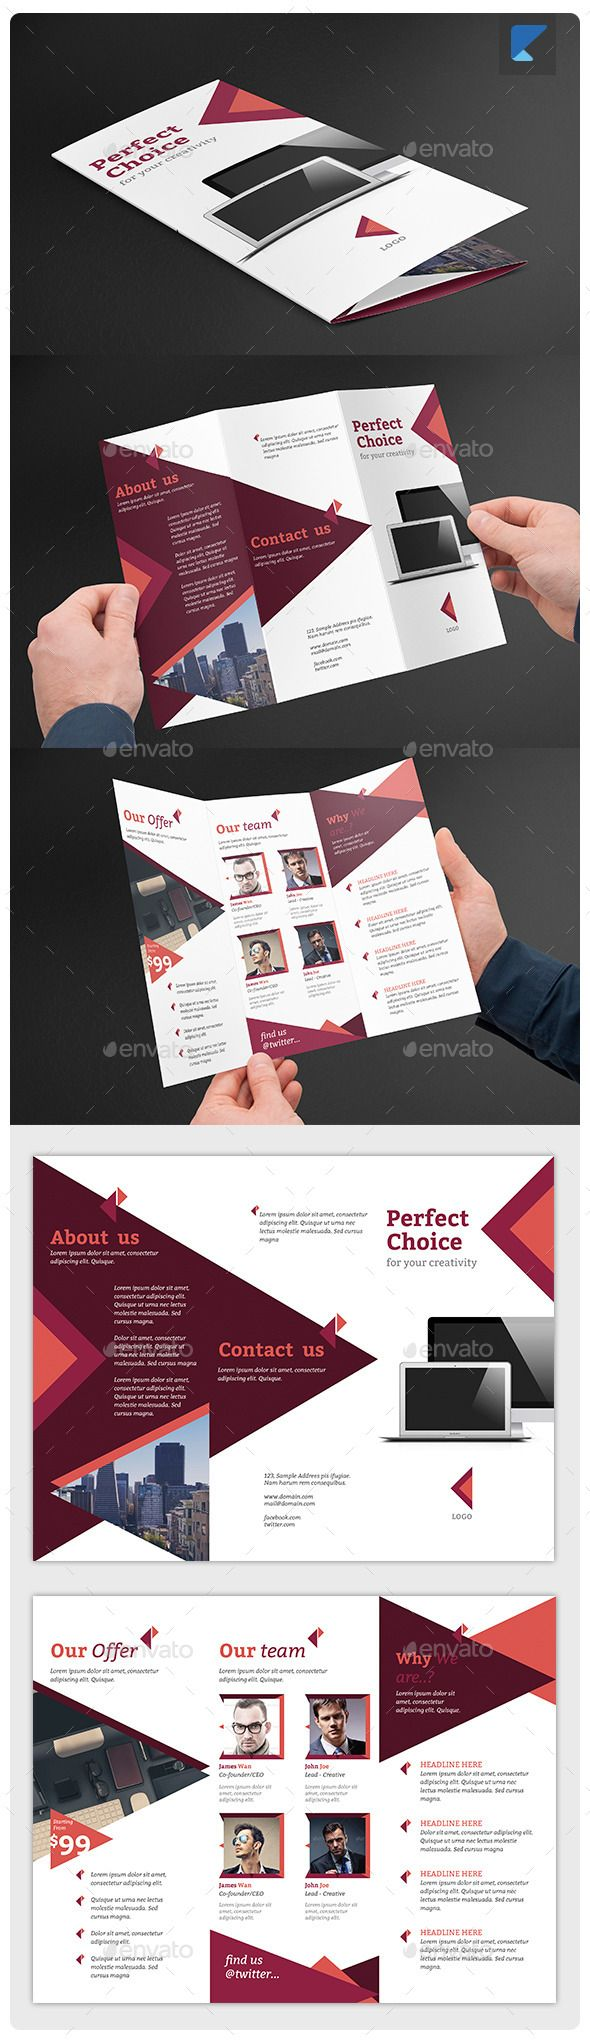 Corporate Trifold Brochure Design Template #brochure Download: http://graphicriver.net/item/corporate-trifold-brochure-v38/11654101?ref=ksioks